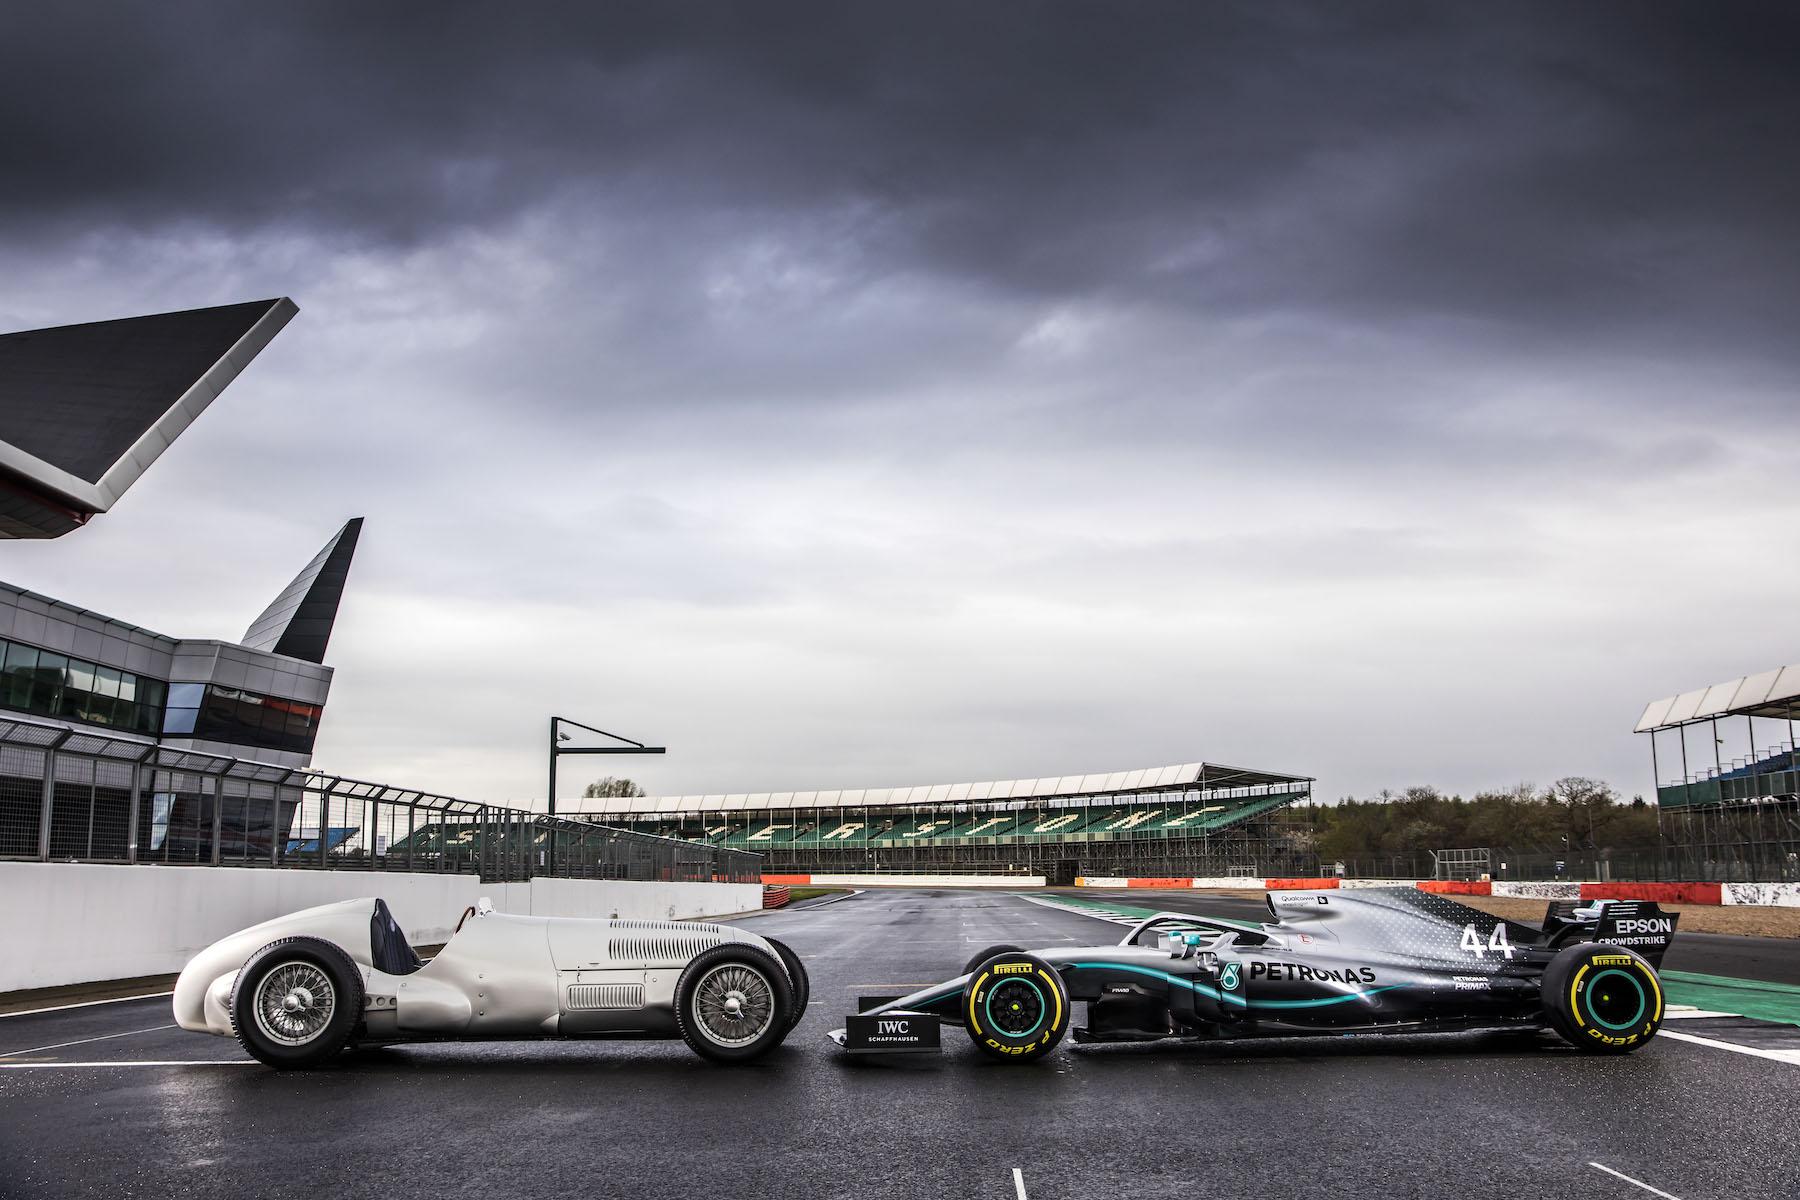 2019 Mercedes 125 years in Motorsports celebration | 2019 Silverstone 14.jpg